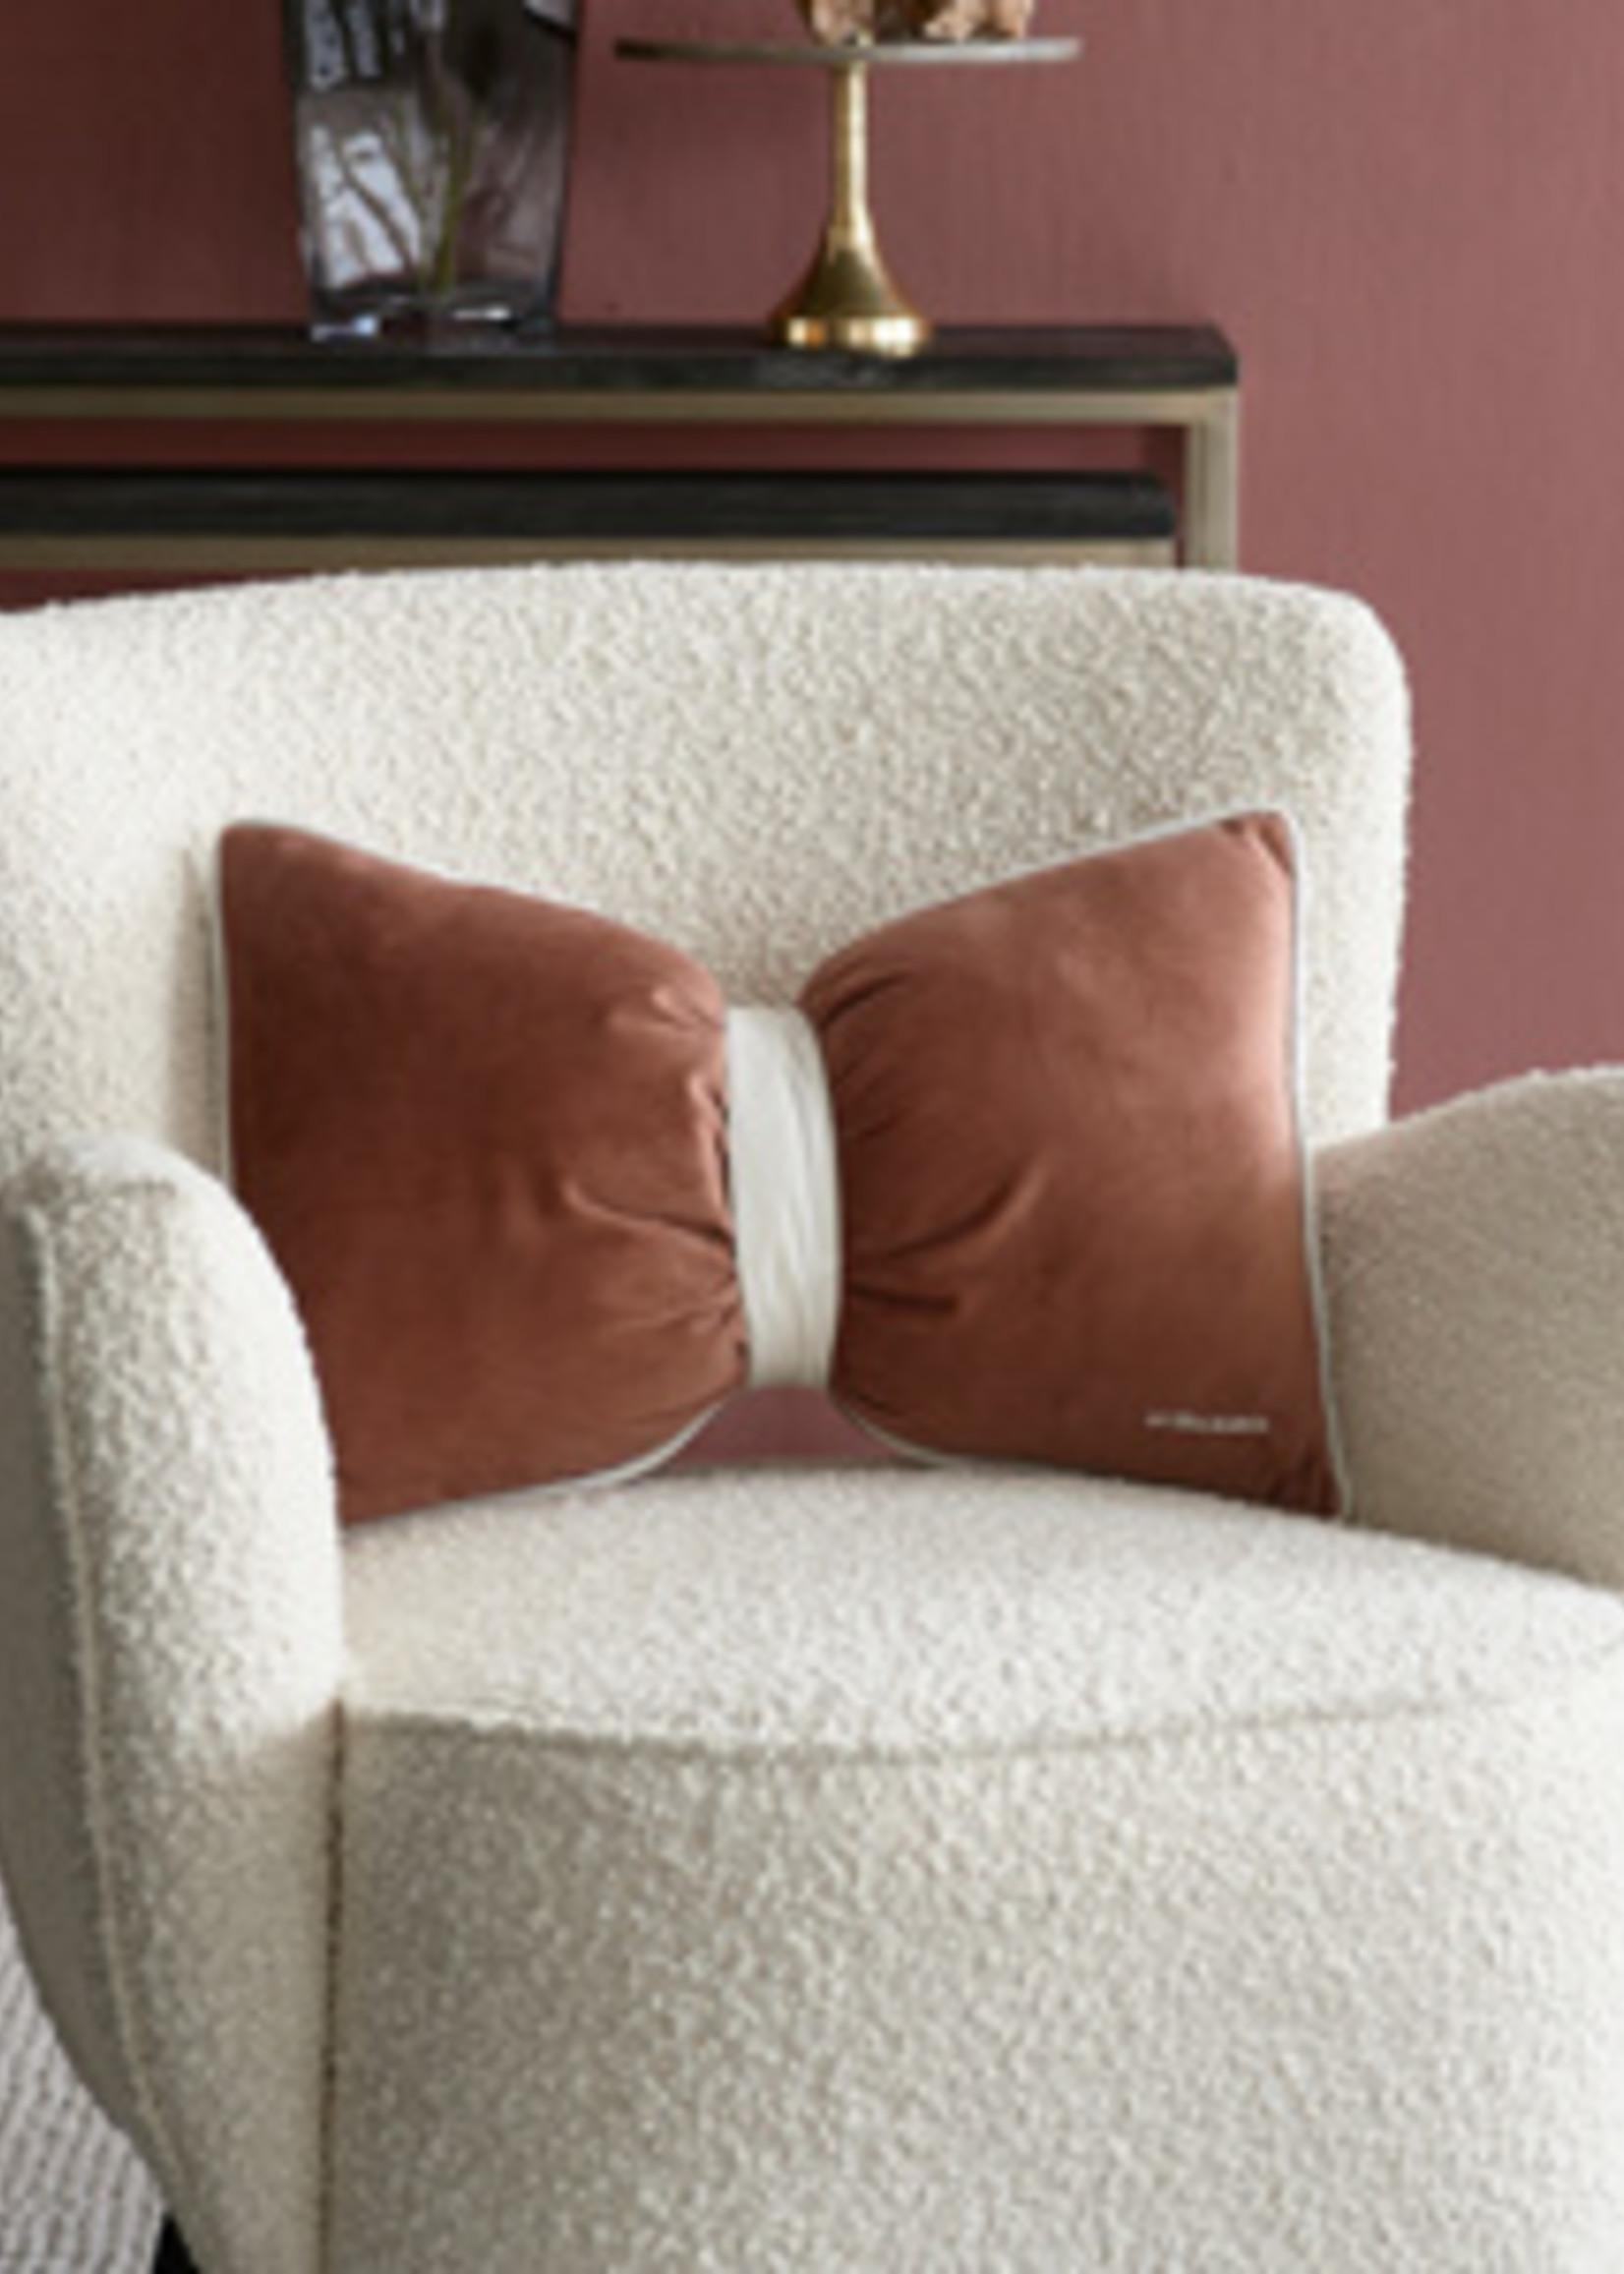 Riviera Maison Purity Bow Box Pillow 50x30